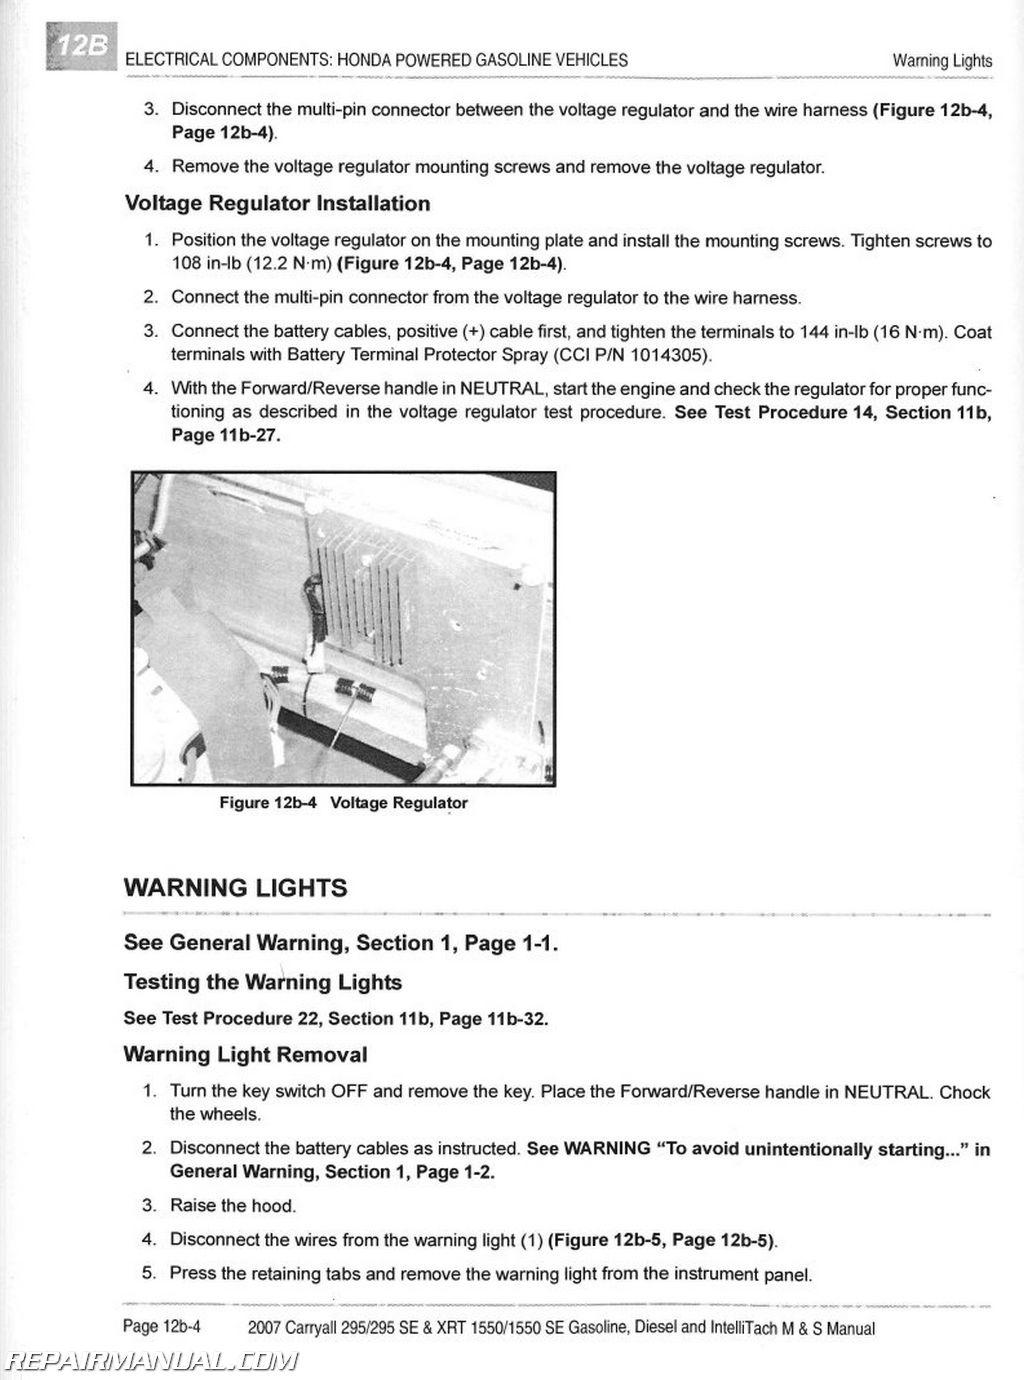 36 Volt Golf Cart Wiring Diagram 2007 Club Car Carryall Service Manual 295 295se Xrt